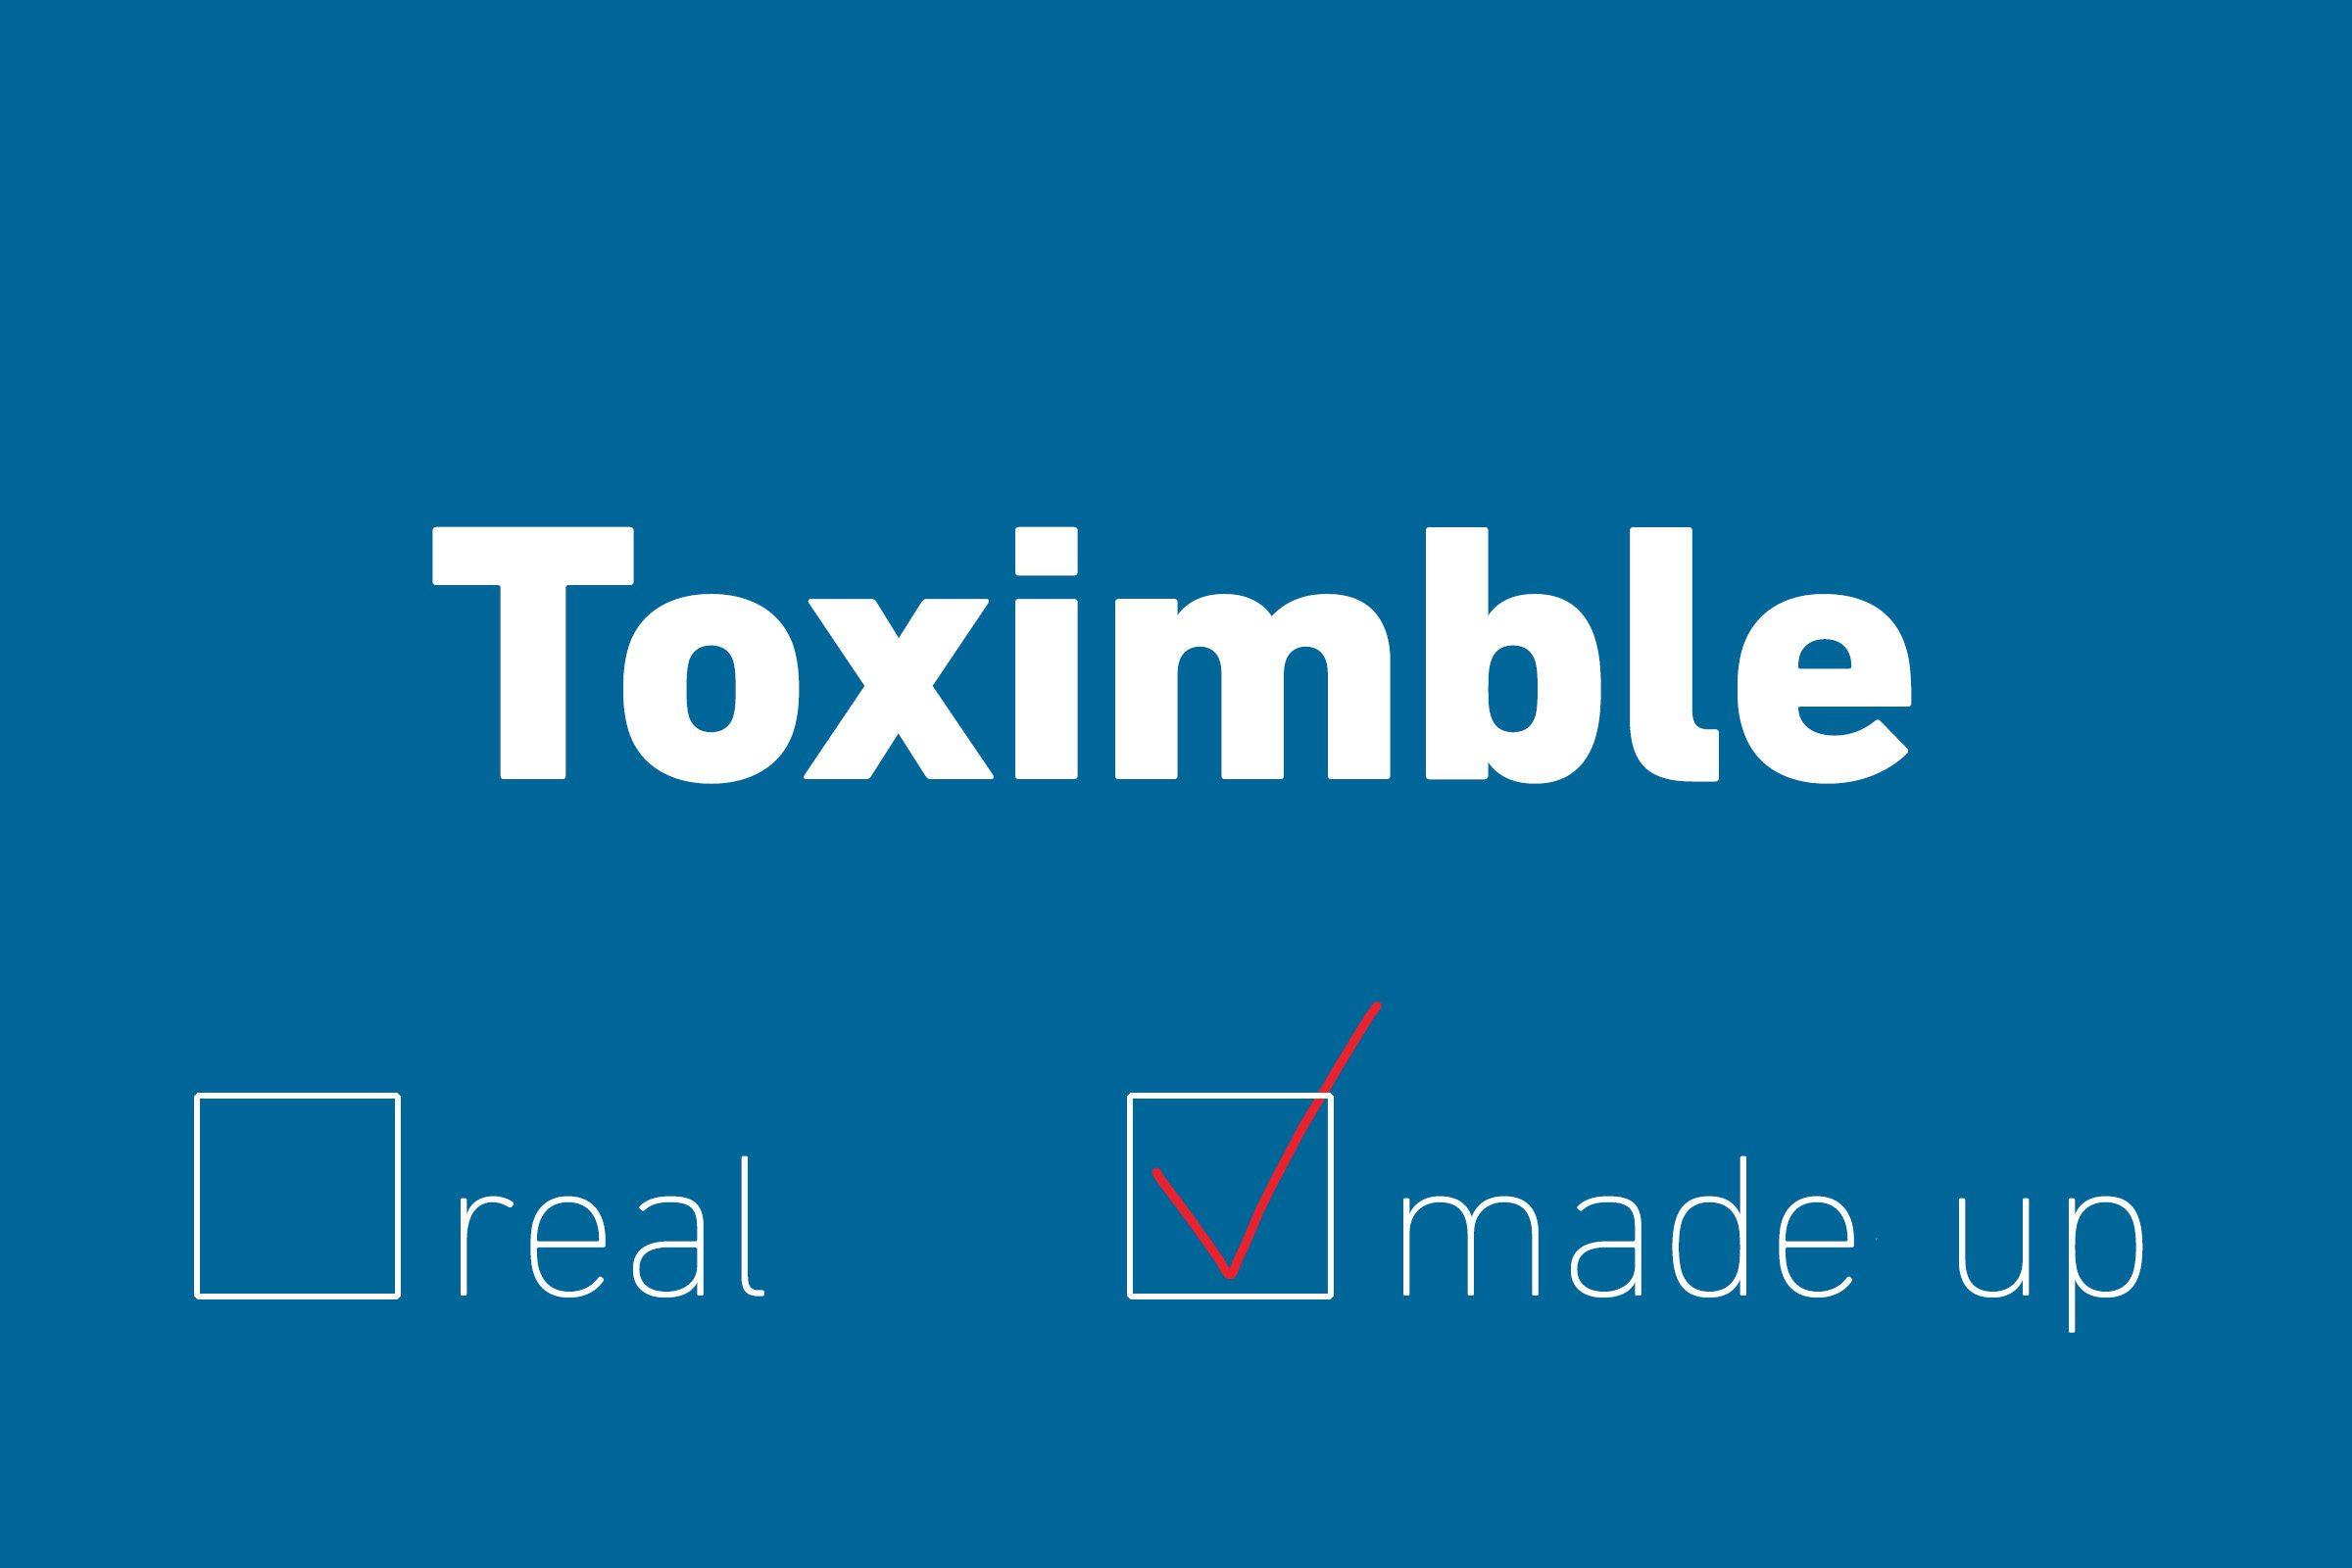 toximble made up